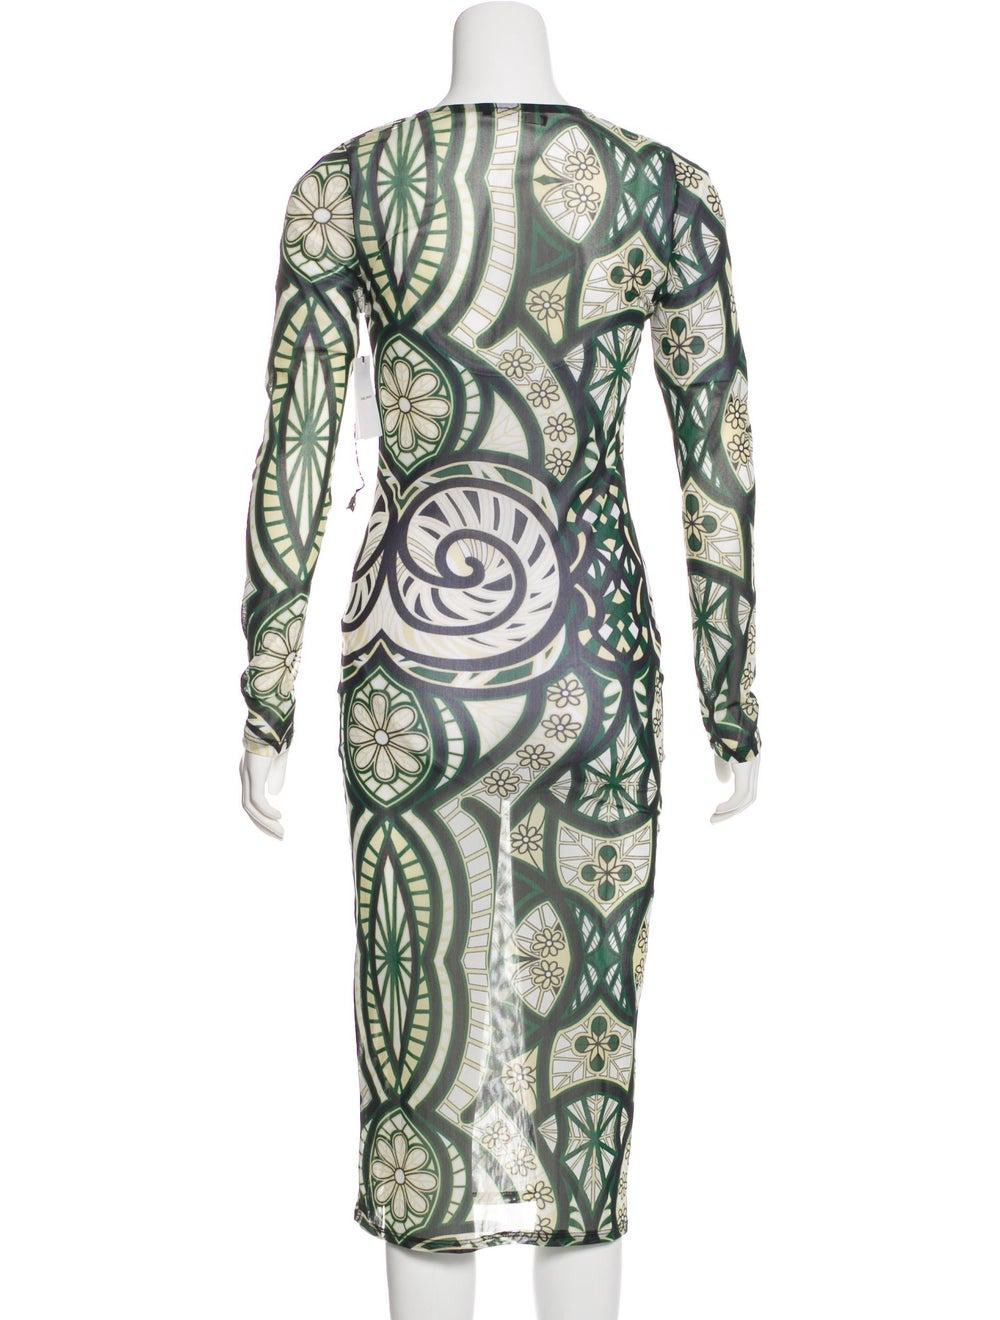 Isabel Marant Knit Midi Dress Green - image 3